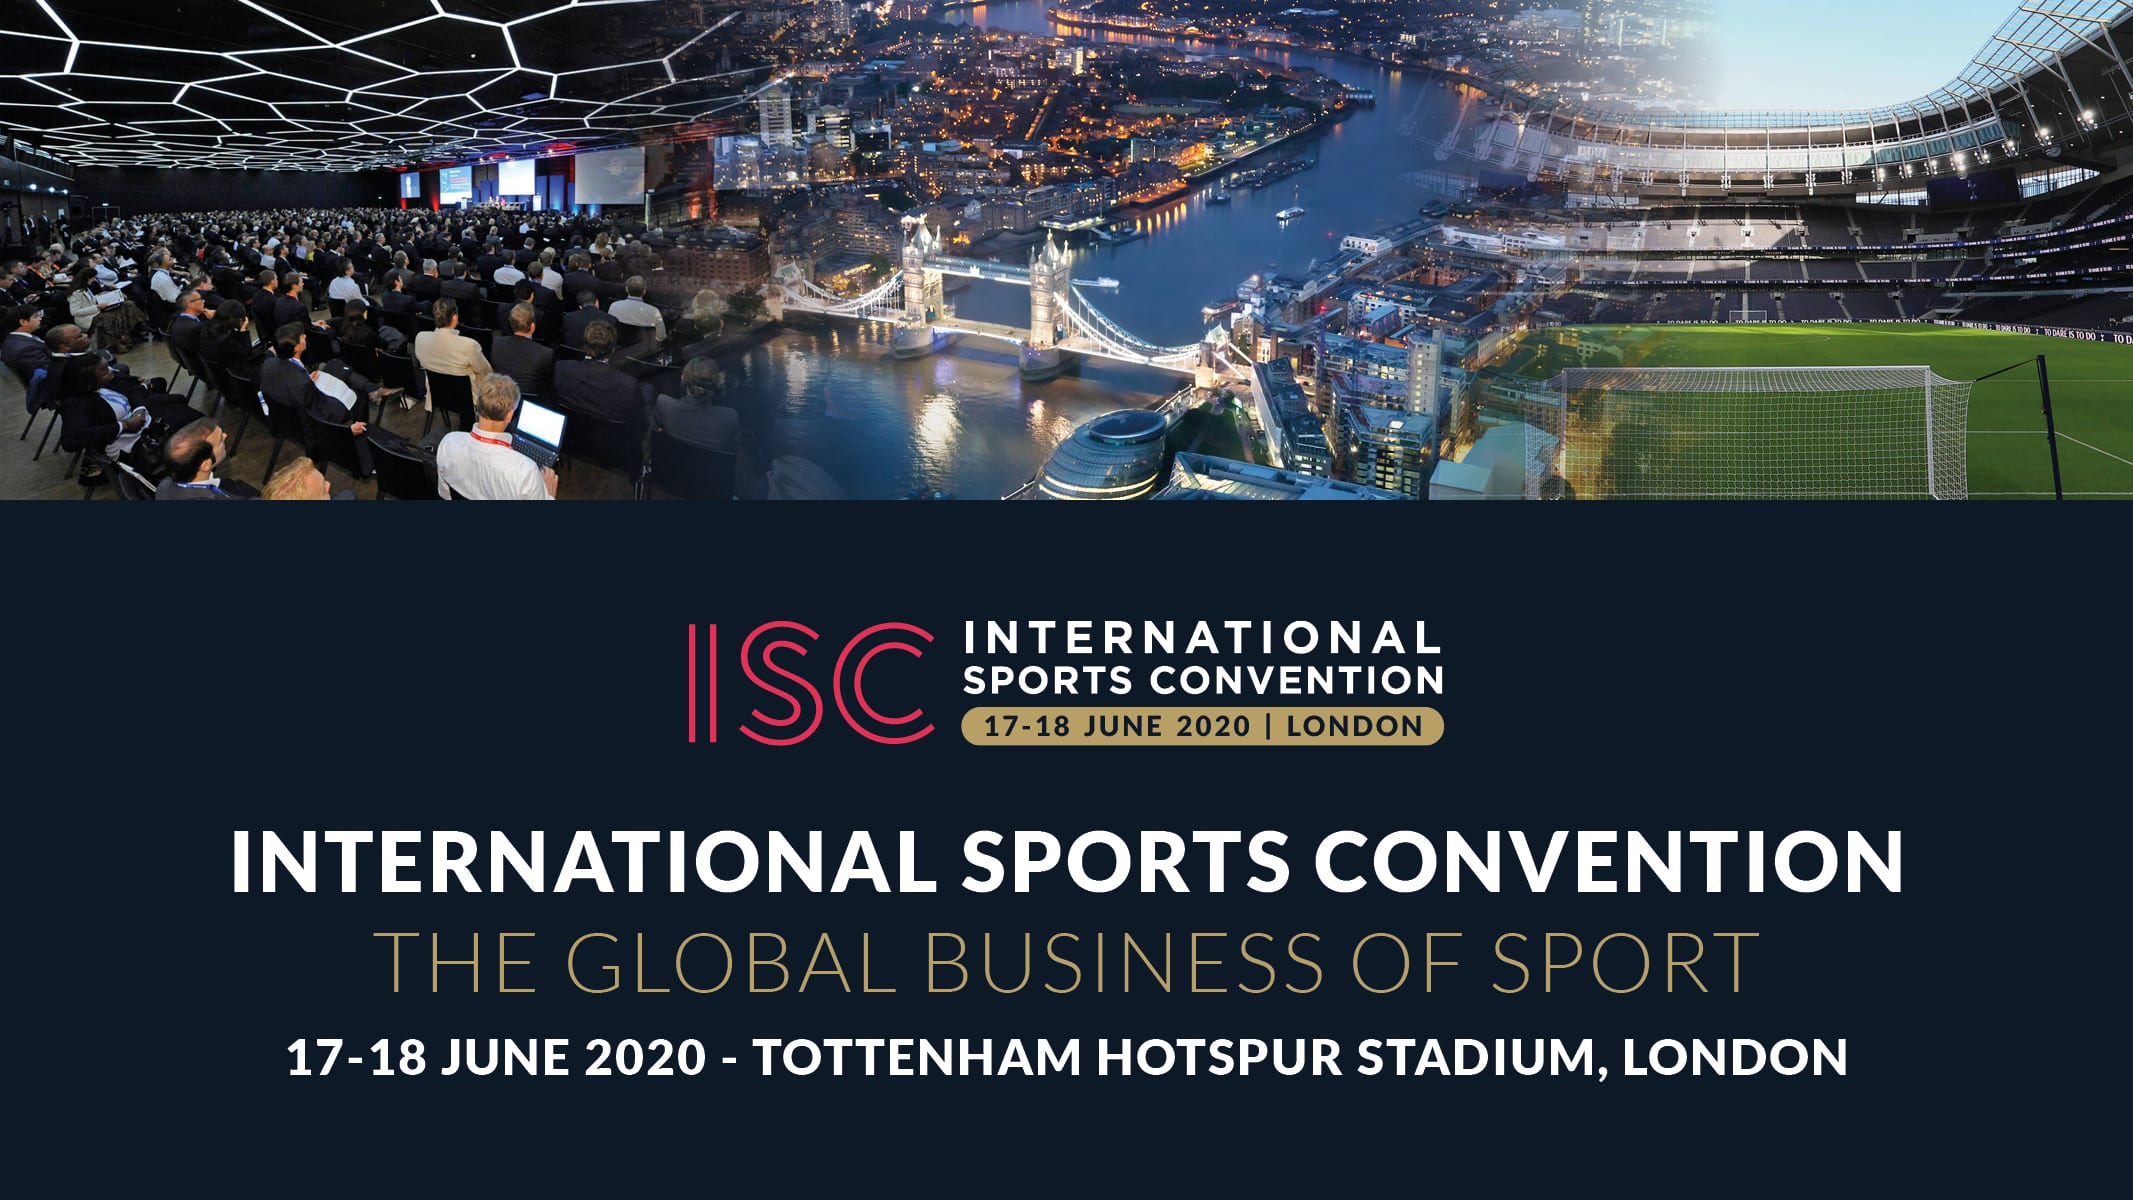 Events In London June 2020.Tottenham Hotspur Stadium To Host International Sports